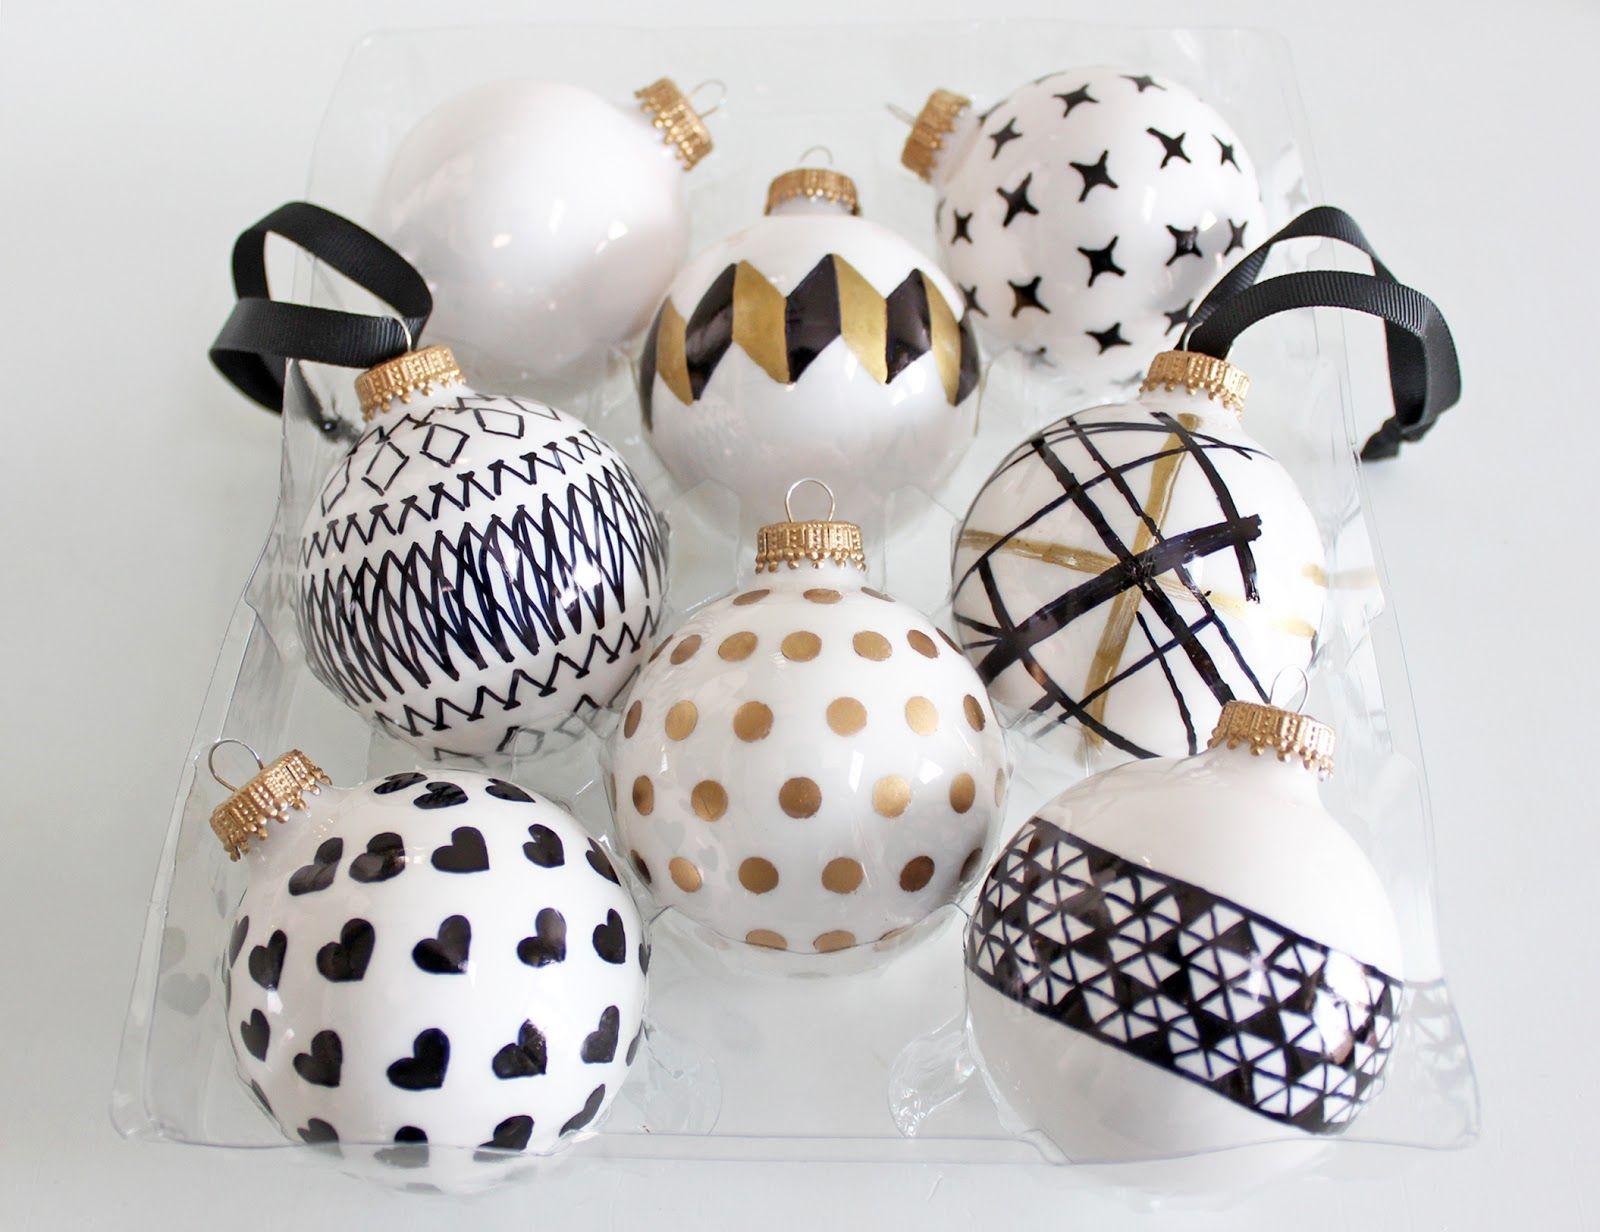 Diy Handpainted Holiday Ball Ornaments Diy Christmas Ornaments Easy Easy Christmas Diy Black White And Gold Christmas